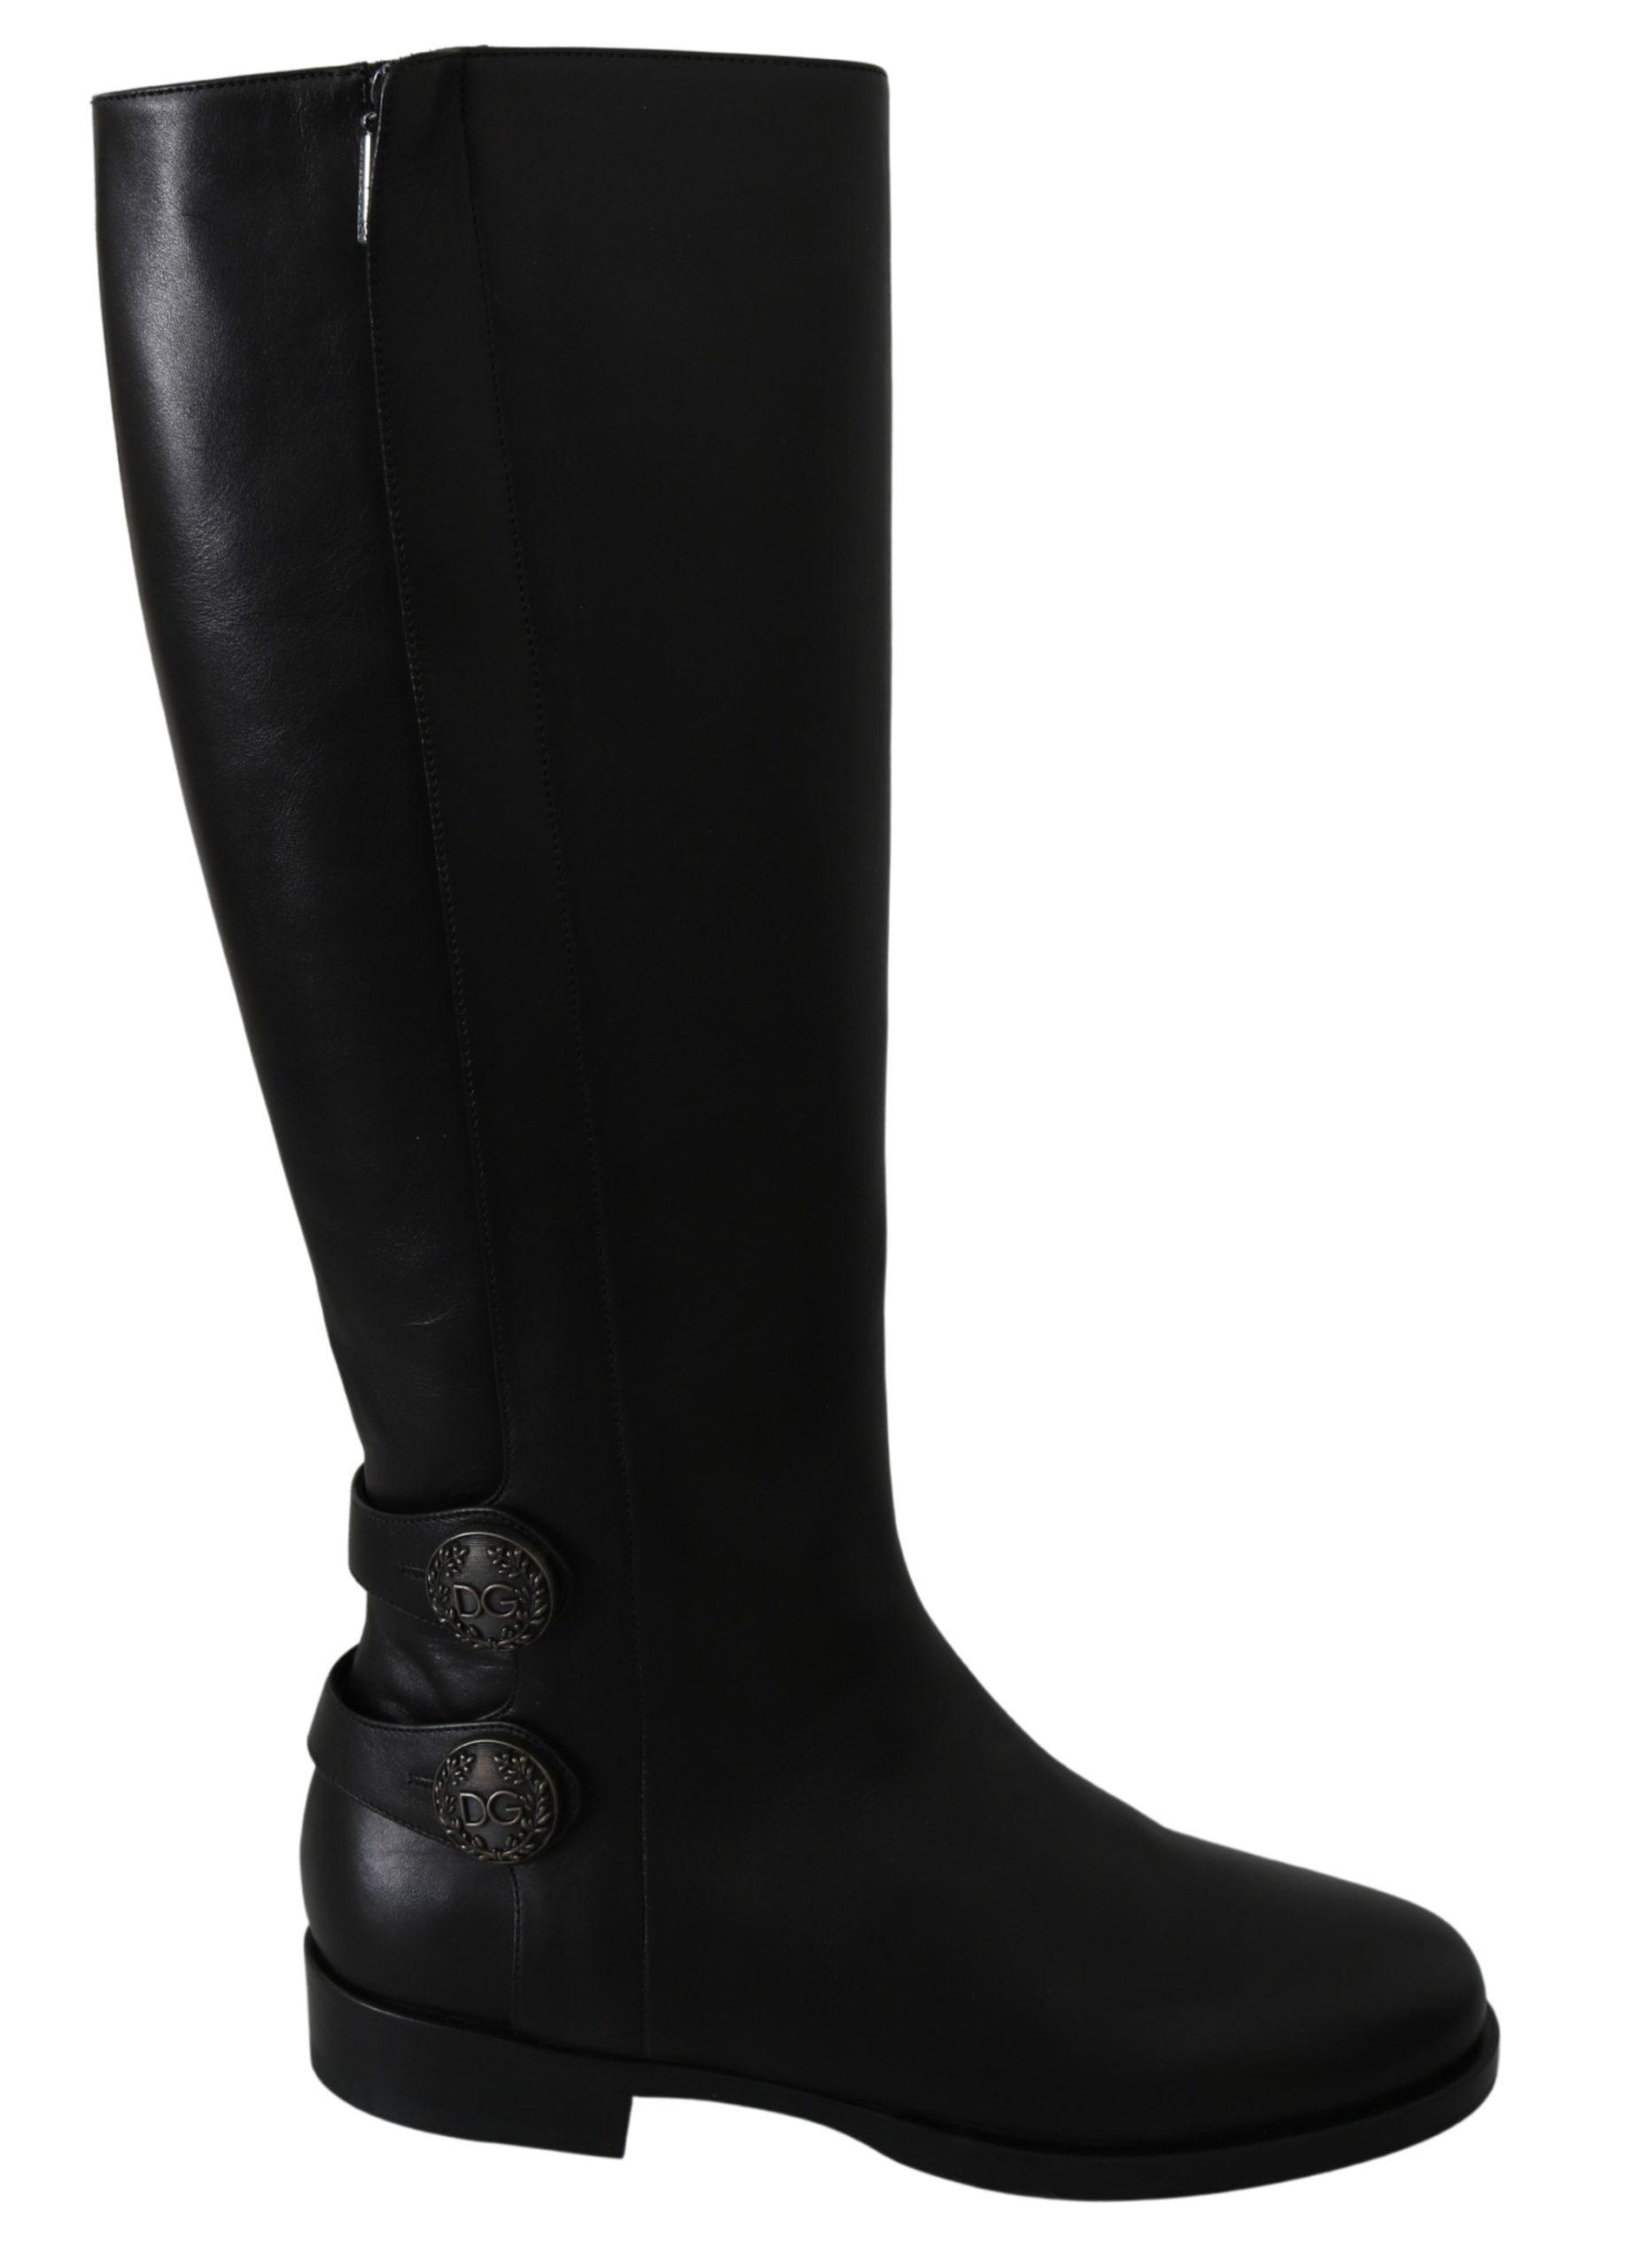 Dolce & Gabbana Women's Leather Knee High Boots Black LA6695 - EU39/US8.5